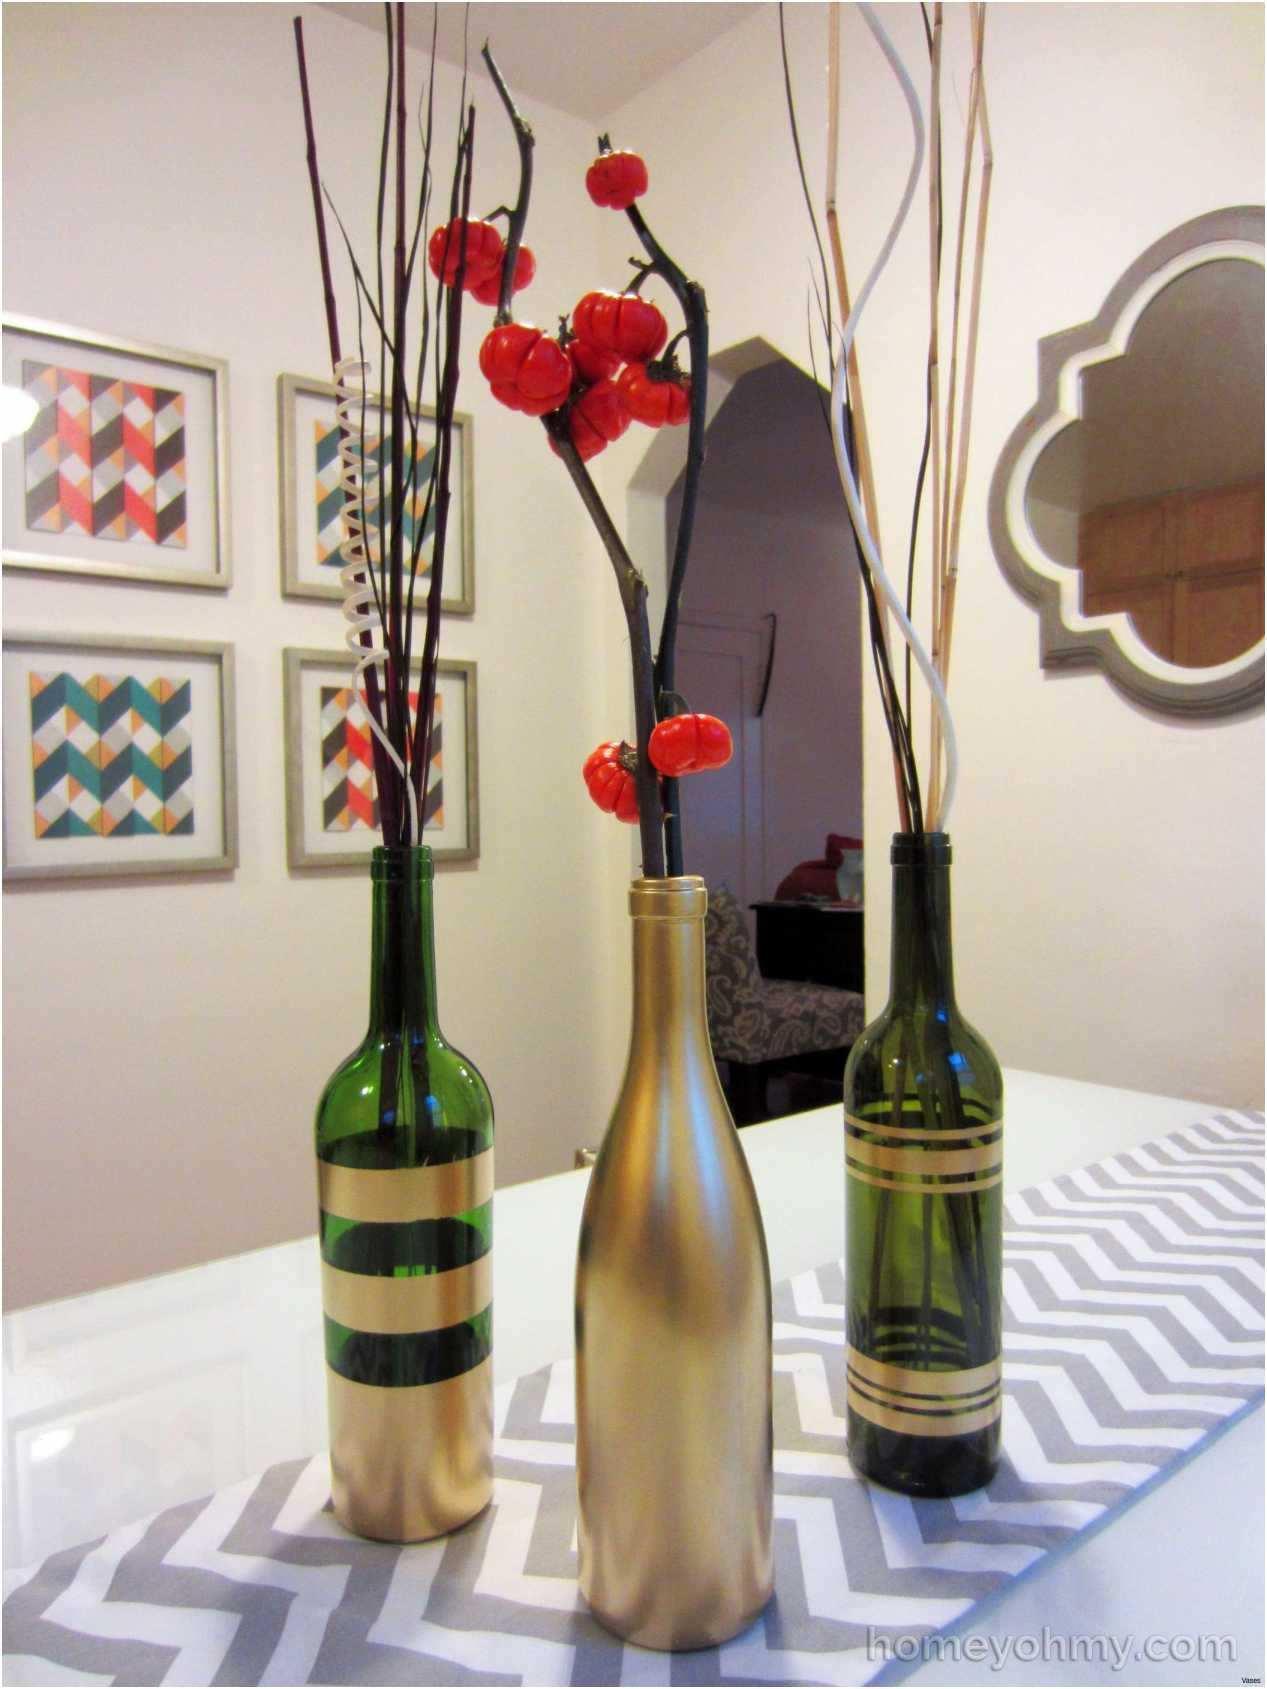 vase painting design ideas of enticing cute simple paintings cute simple paintings suitable h within enticing cute simple paintings cute simple paintings suitable h vases how to paint ideas i